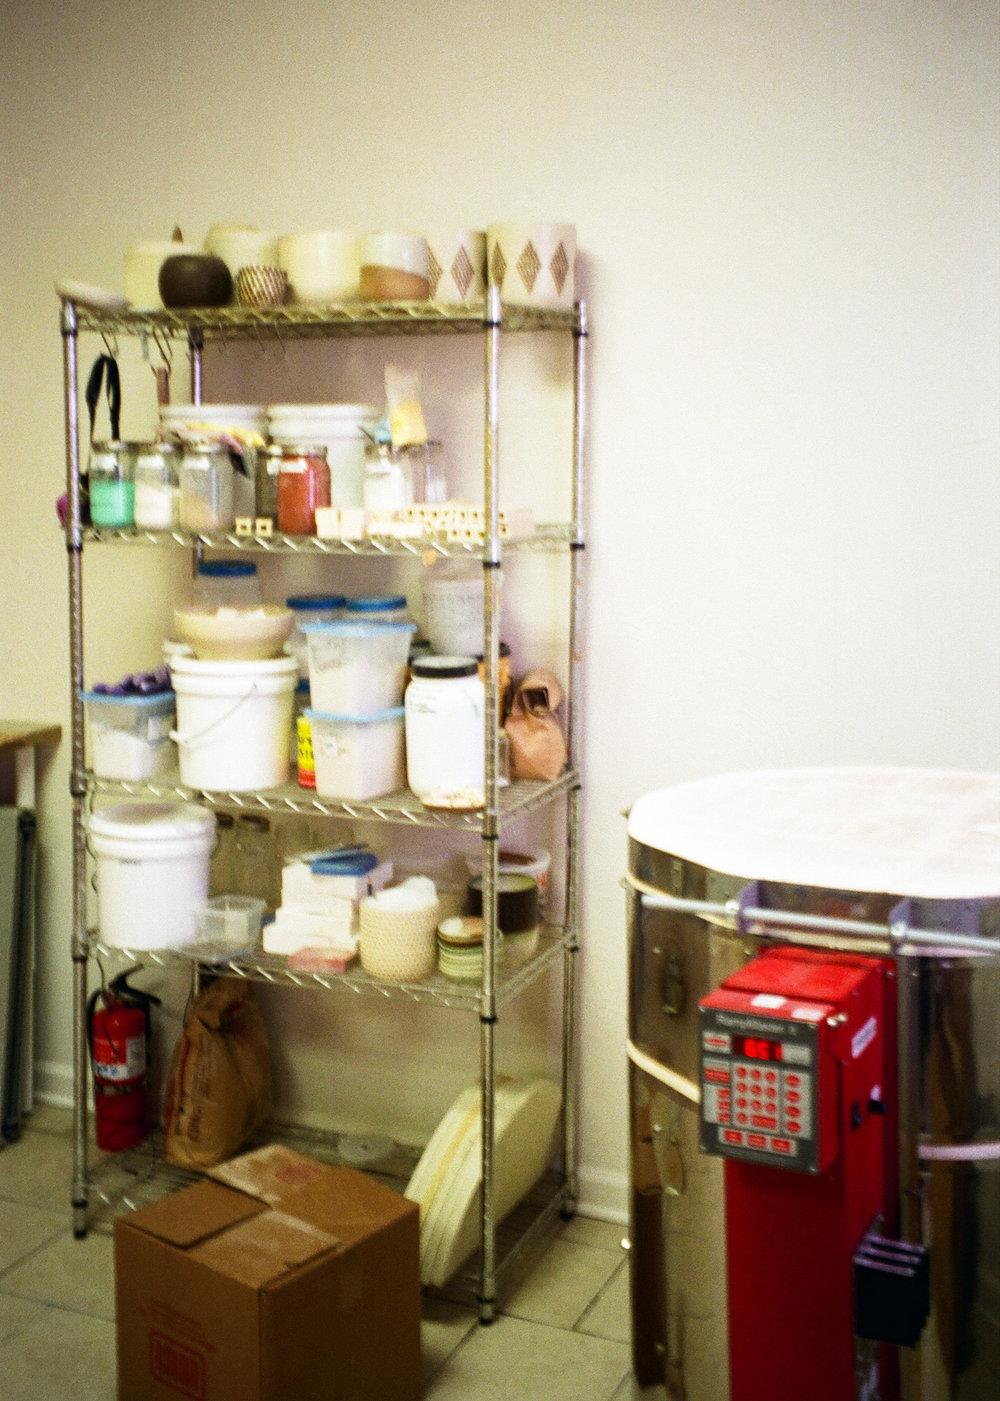 kiln and clay supplies